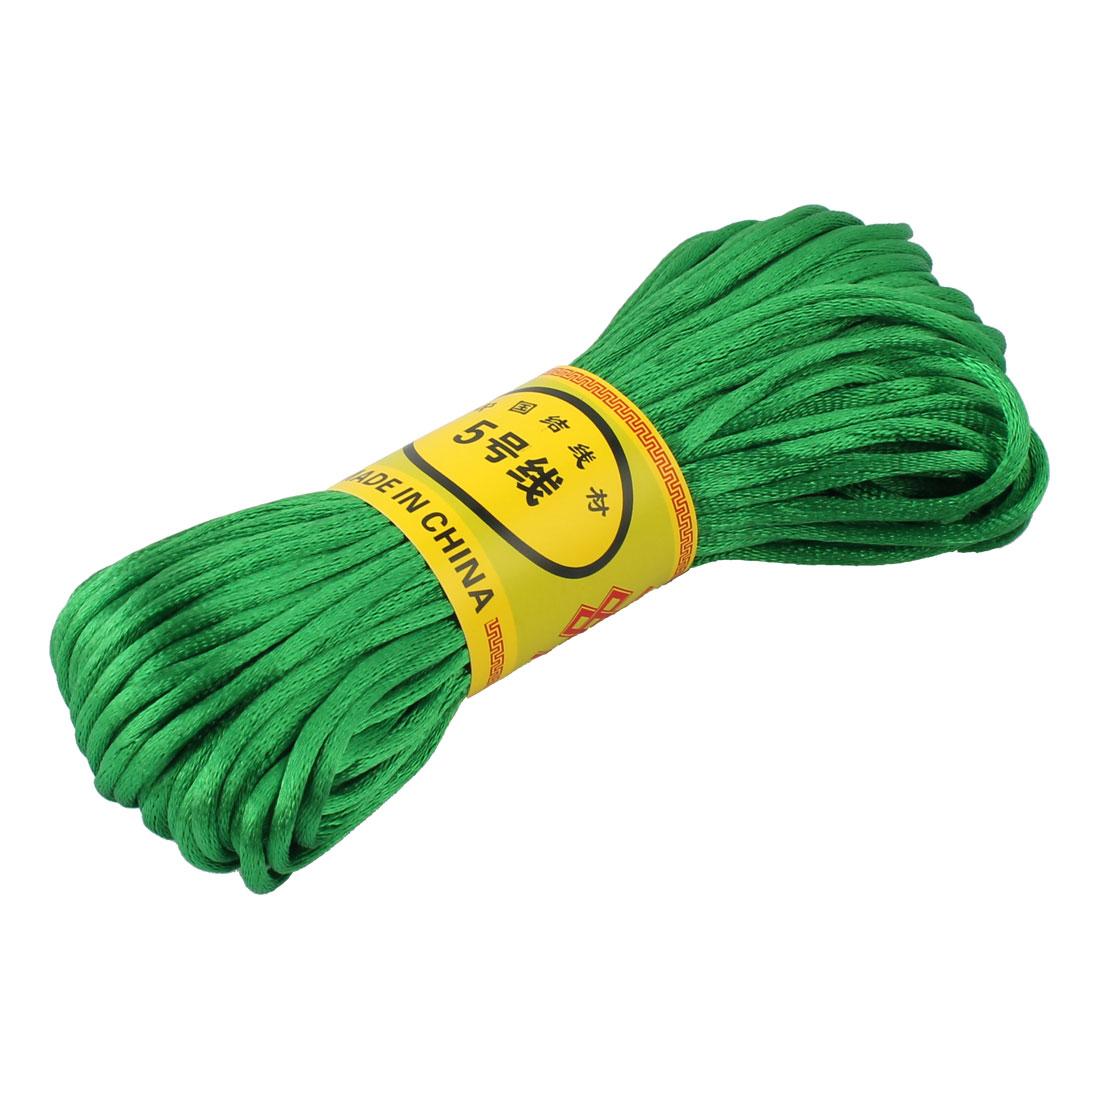 Green Nylon Cord Thread DIY Chinese Knot Macrame Rattail Bracelet Braided String 20M